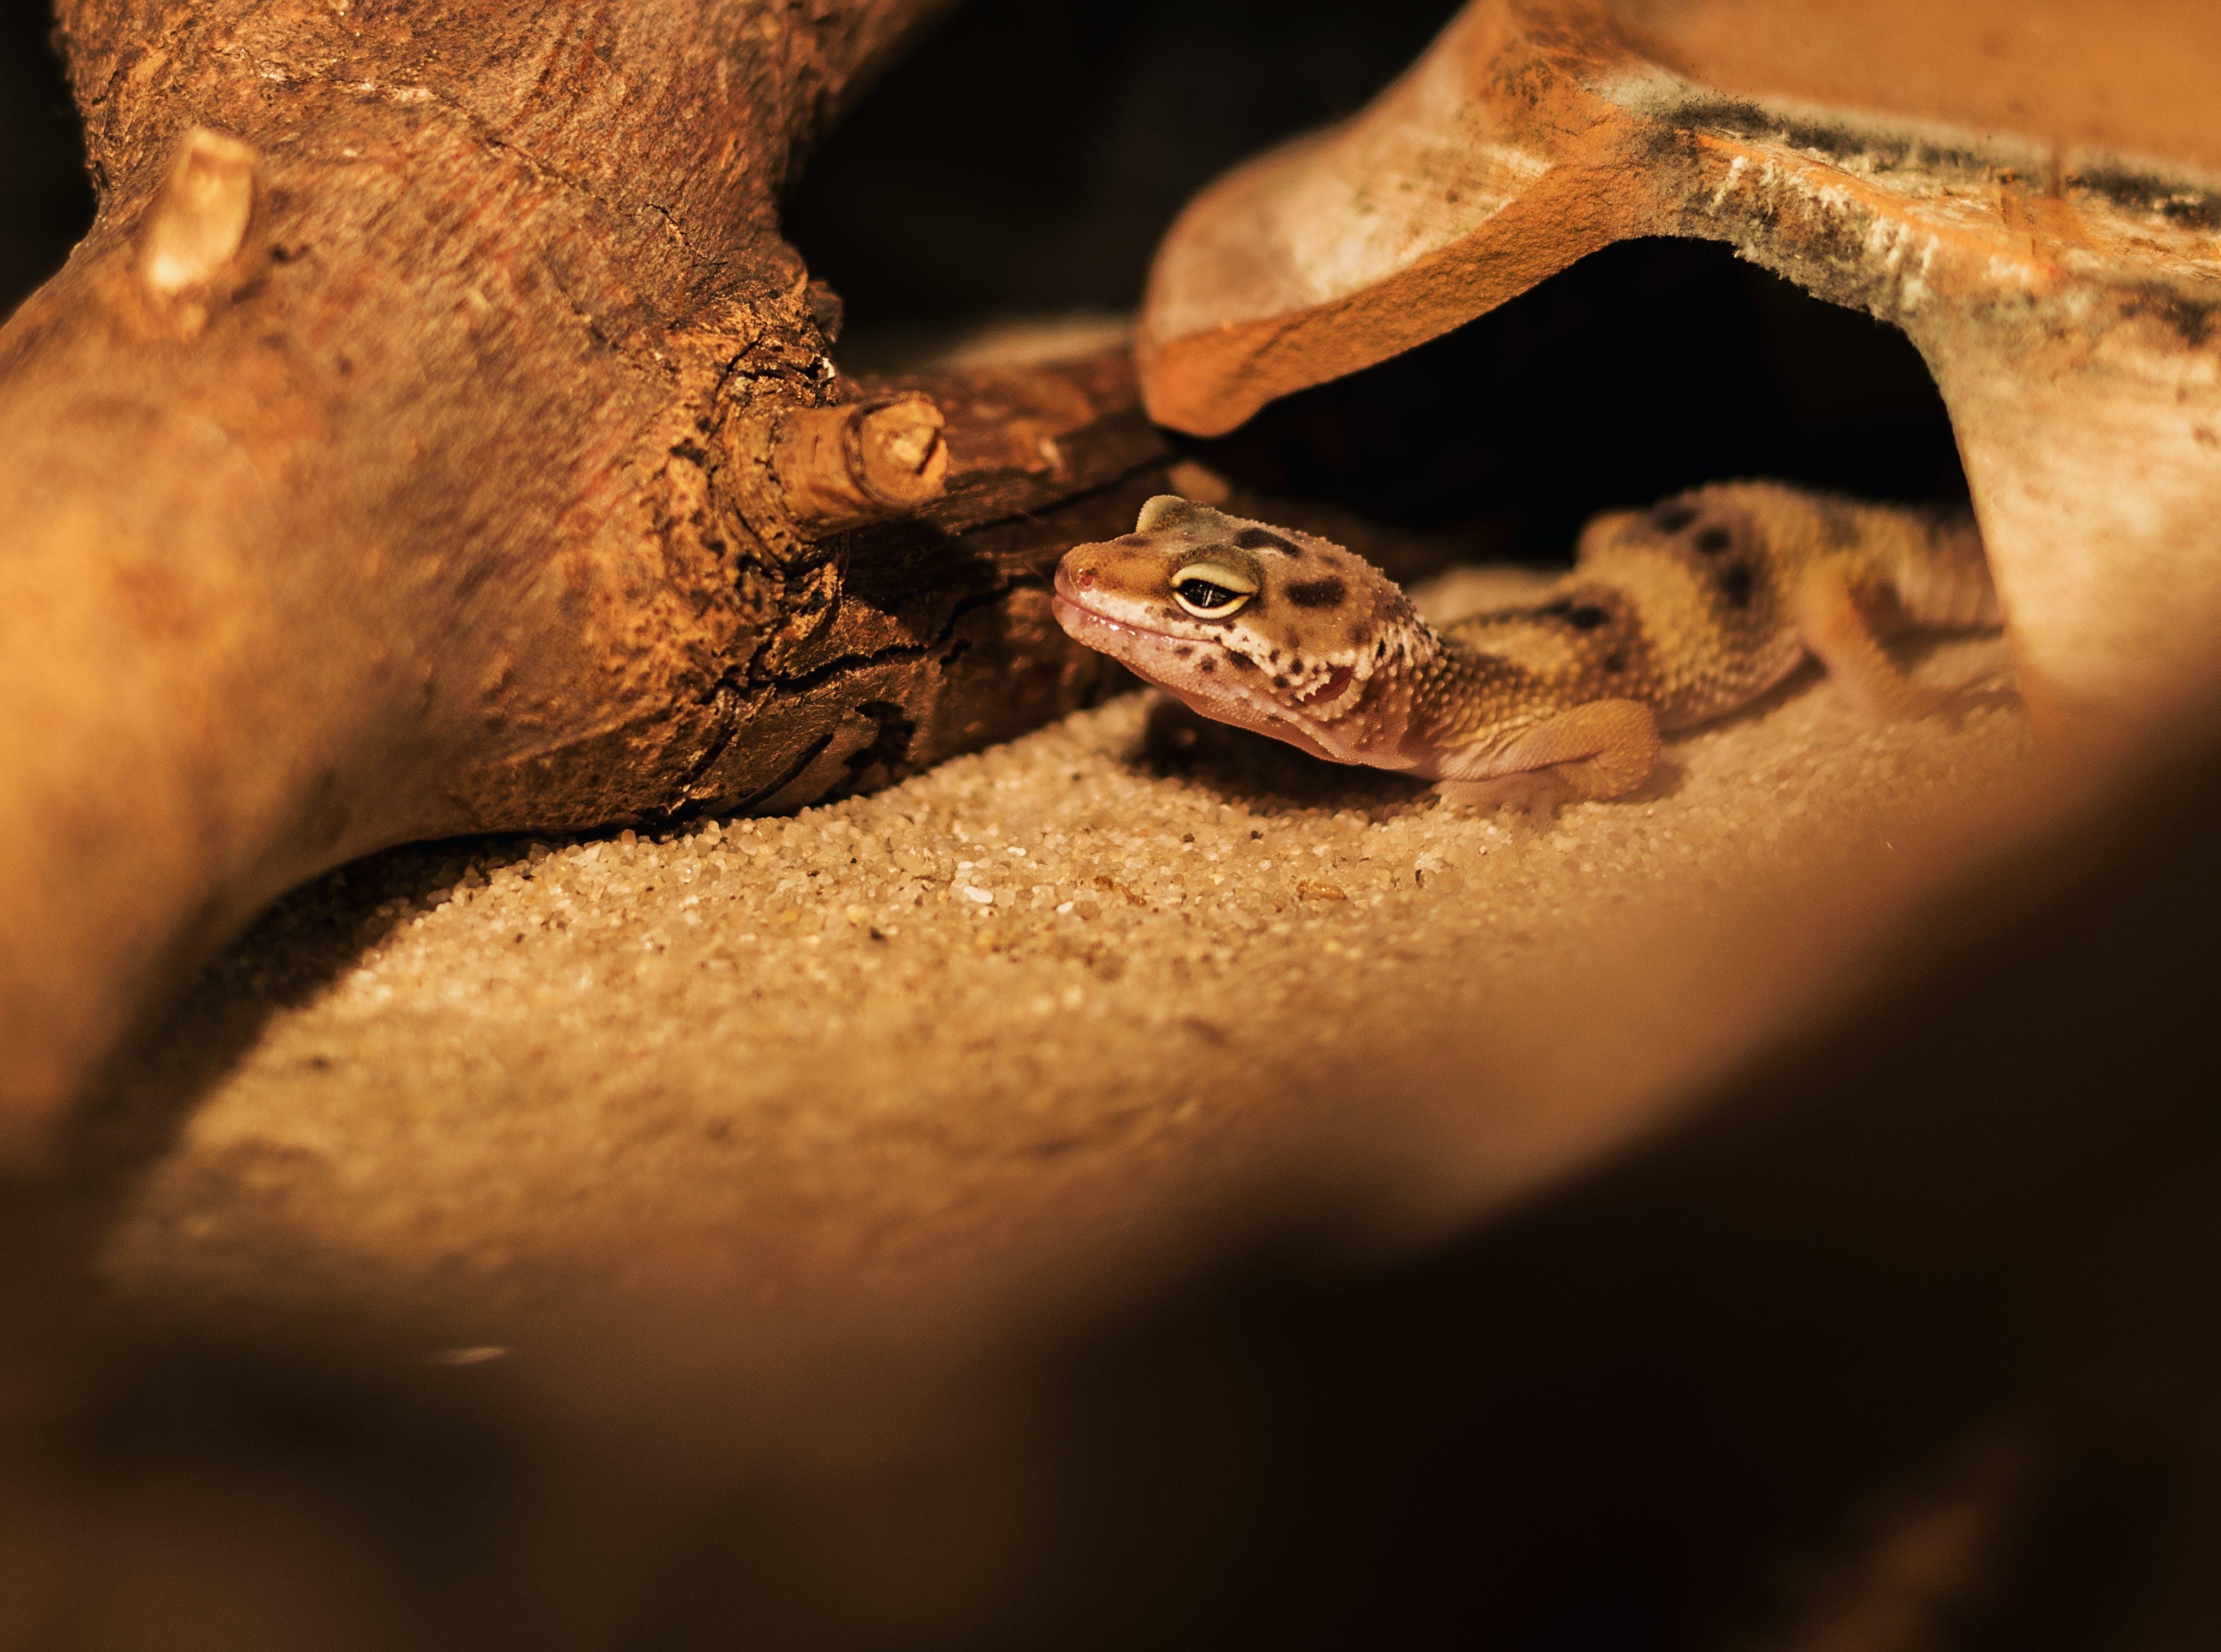 Pet Gecko Near Tree Log